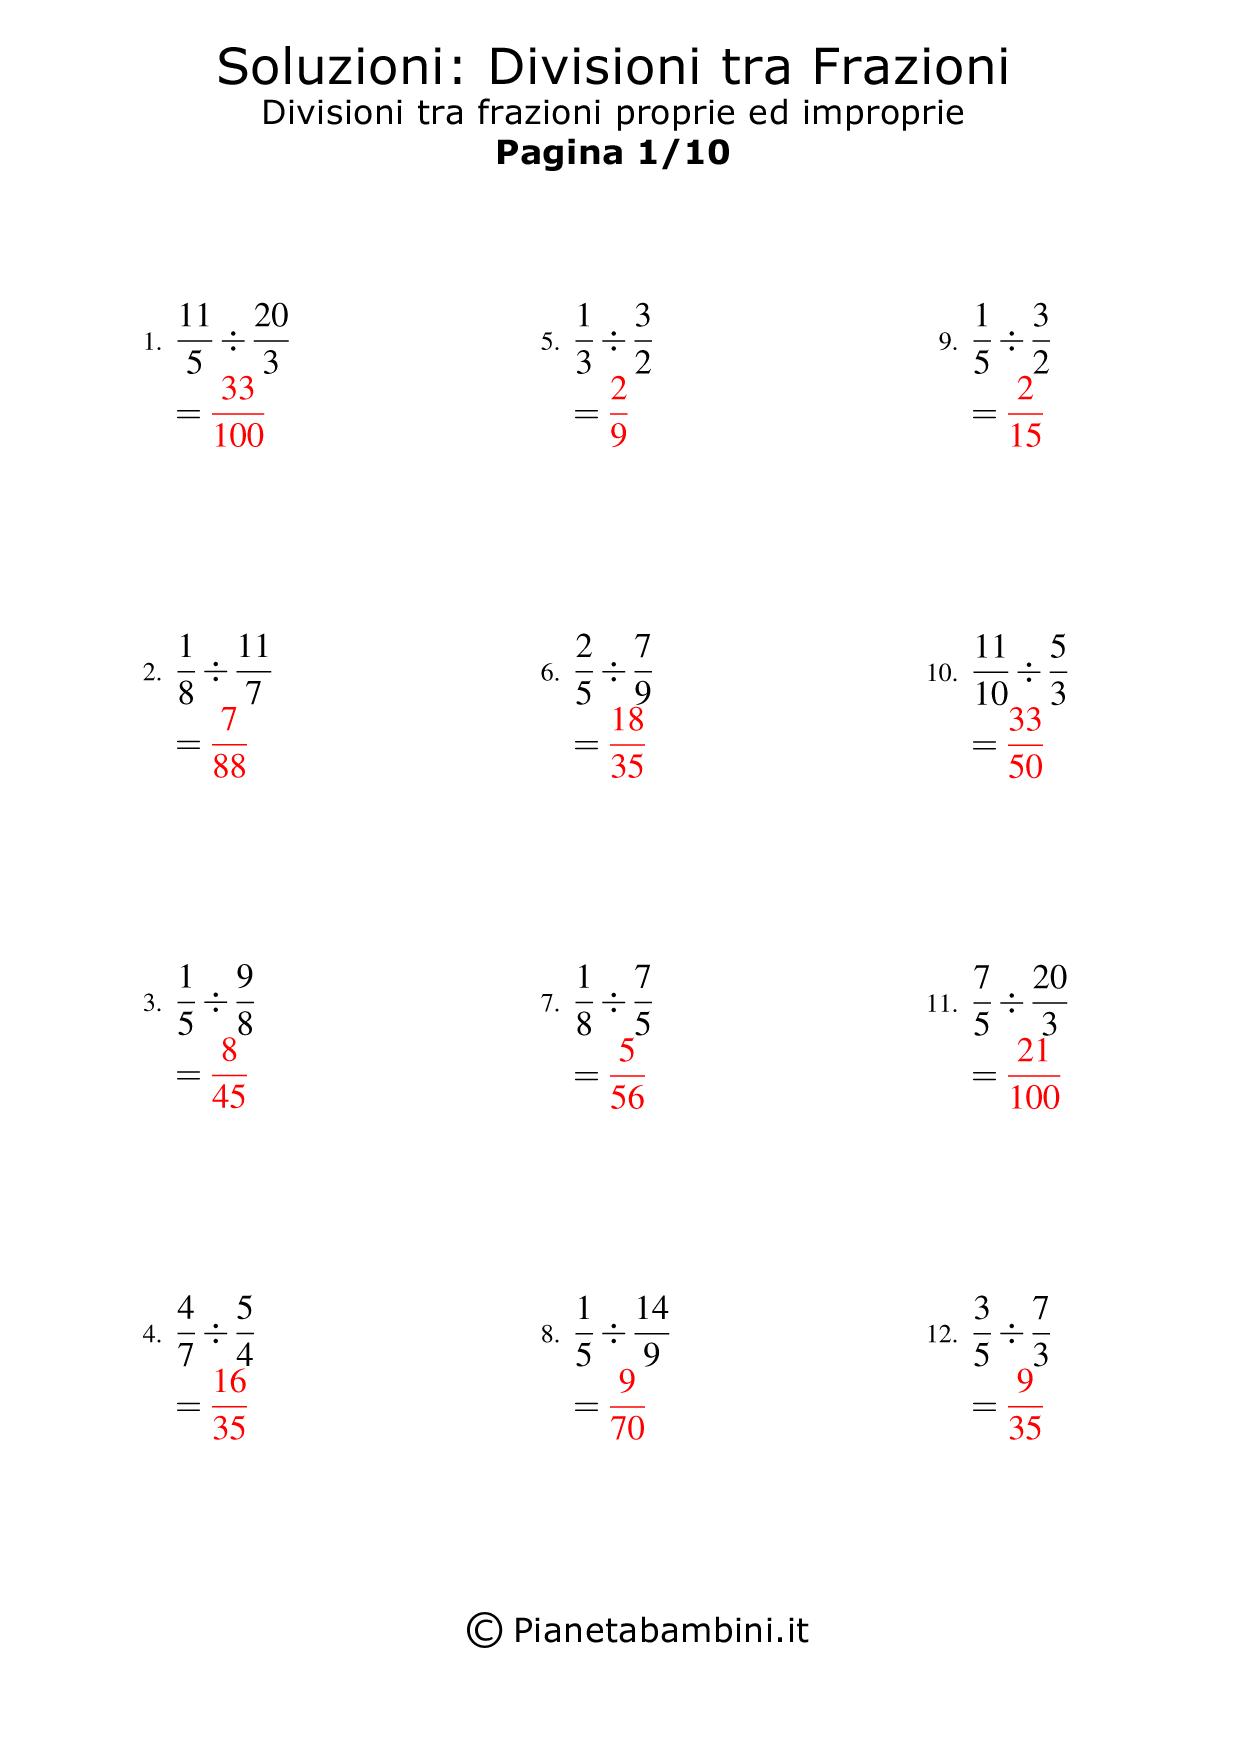 Soluzioni-Divisioni-Frazioni-Proprie-Improprie_01